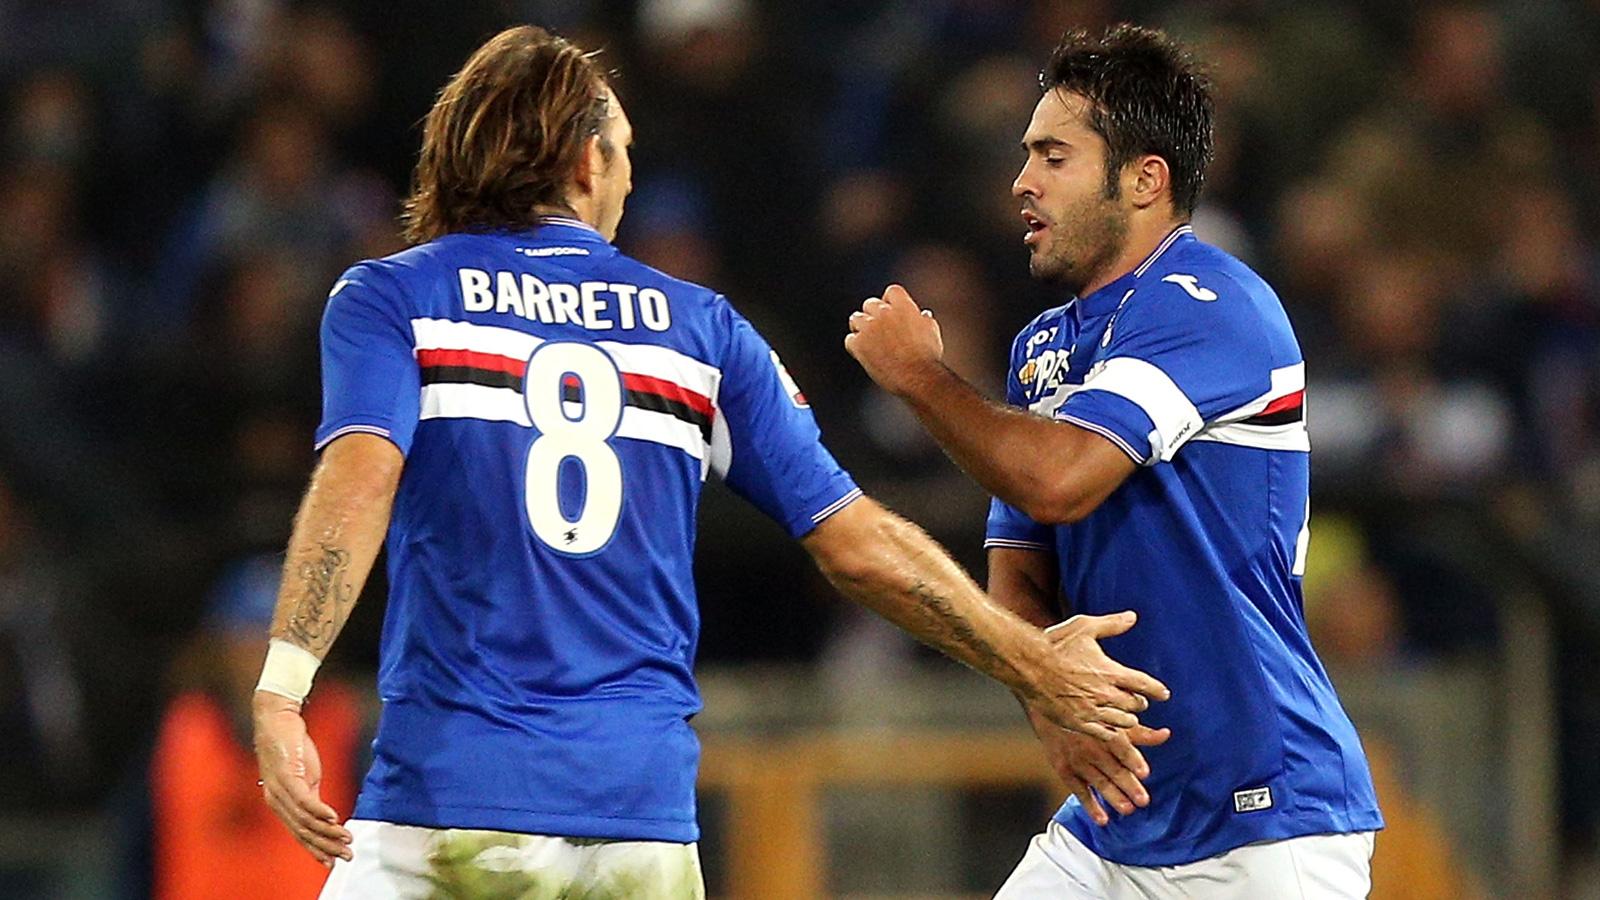 Sampdoria stay unbeaten at home with draw vs. Empoli